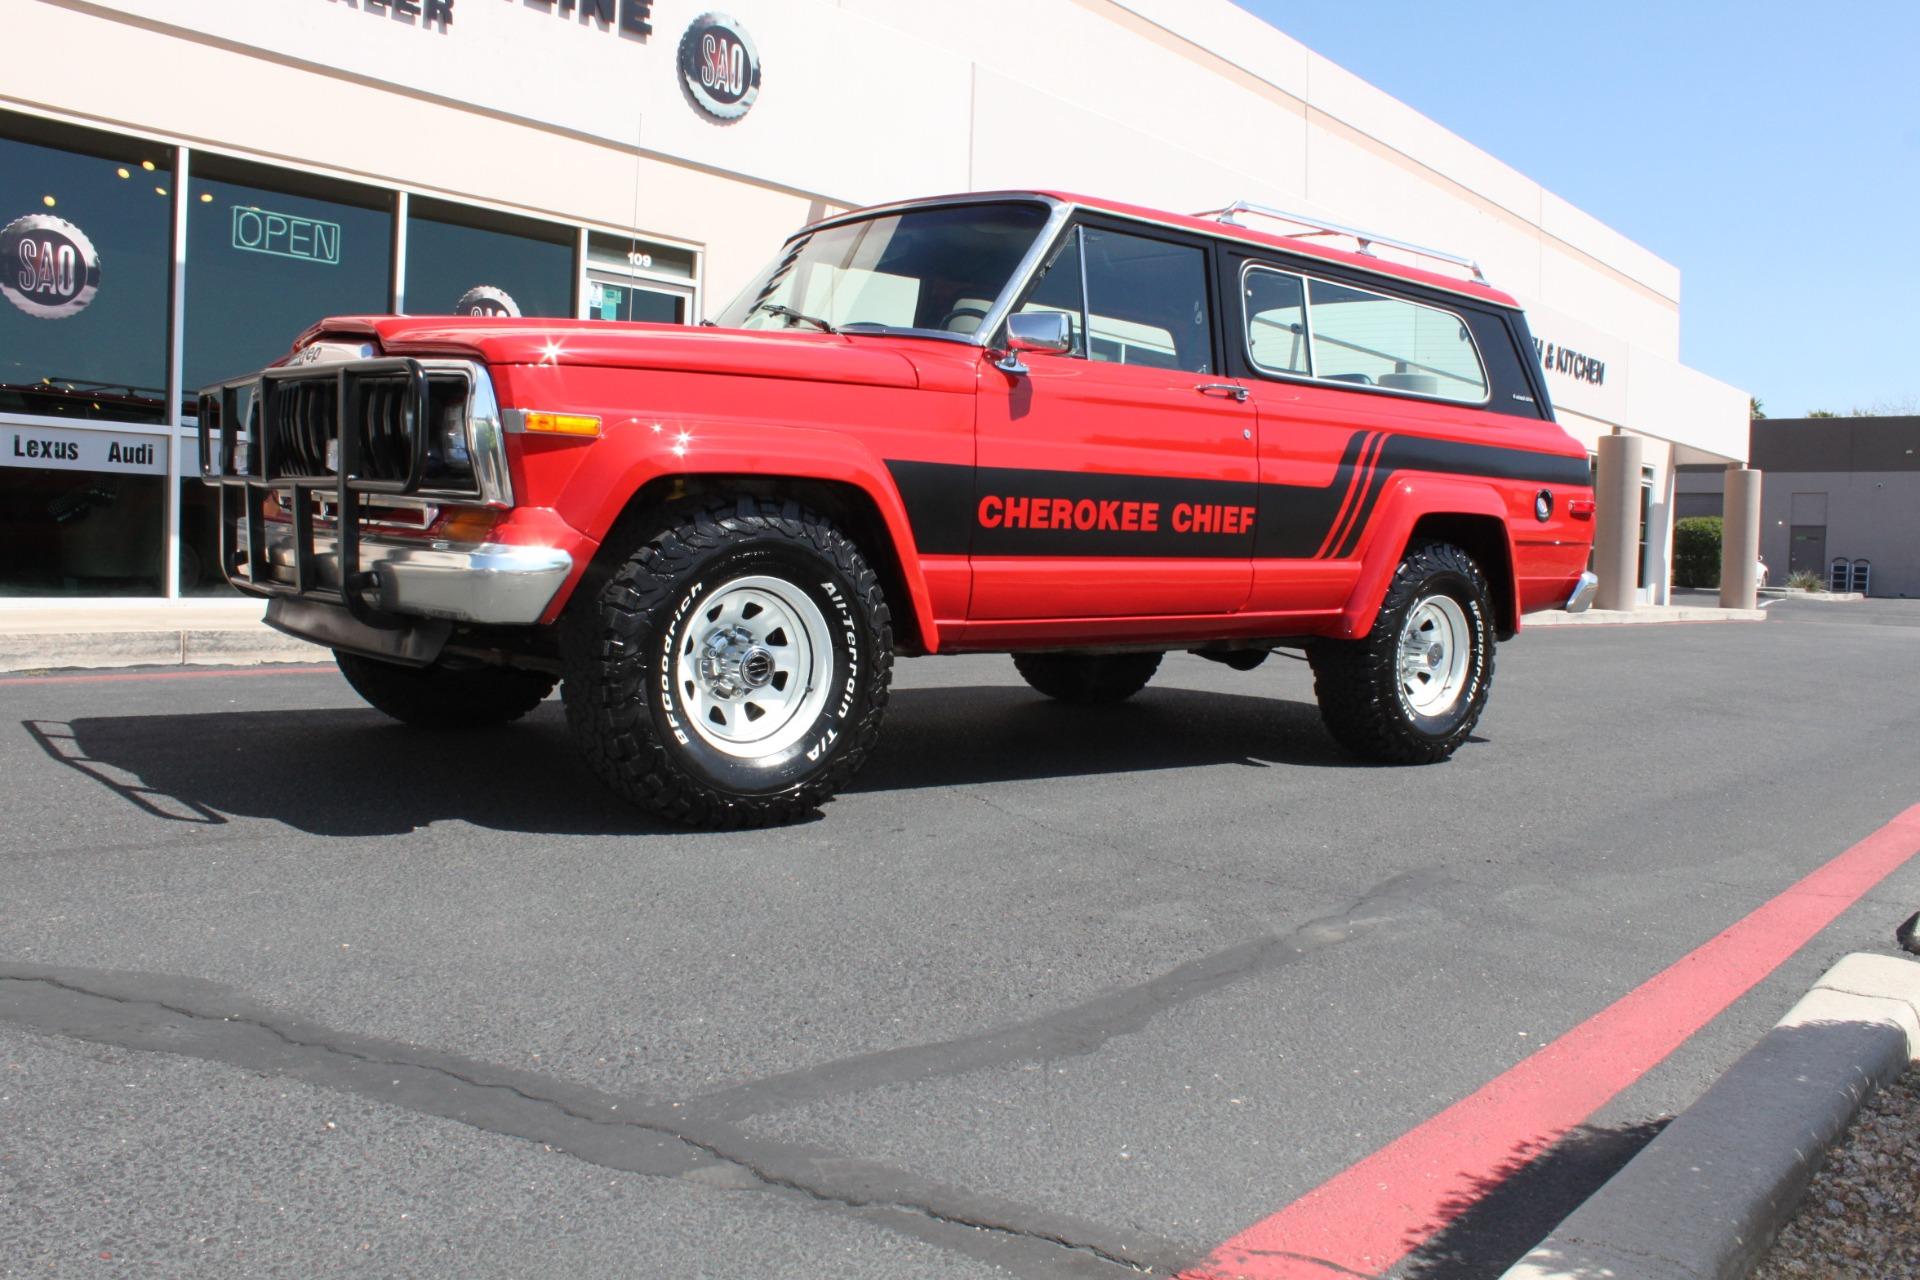 Used-1983-Jeep-Cherokee-4WD-Chief-Lexus